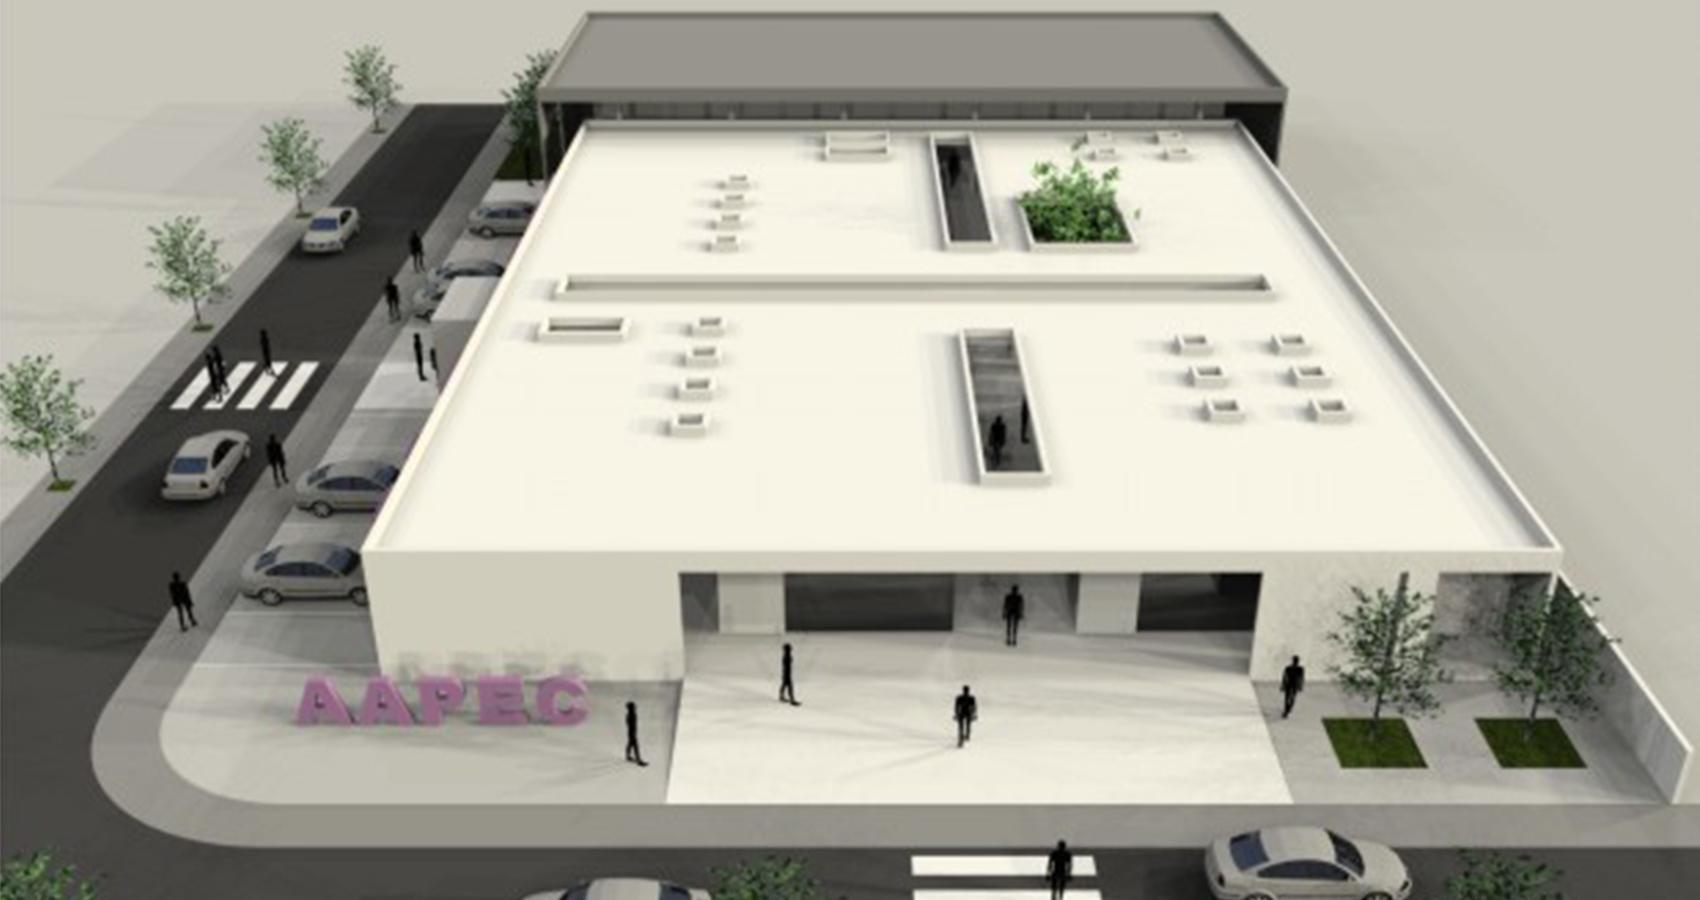 PJV Arquitetura - AAPEC